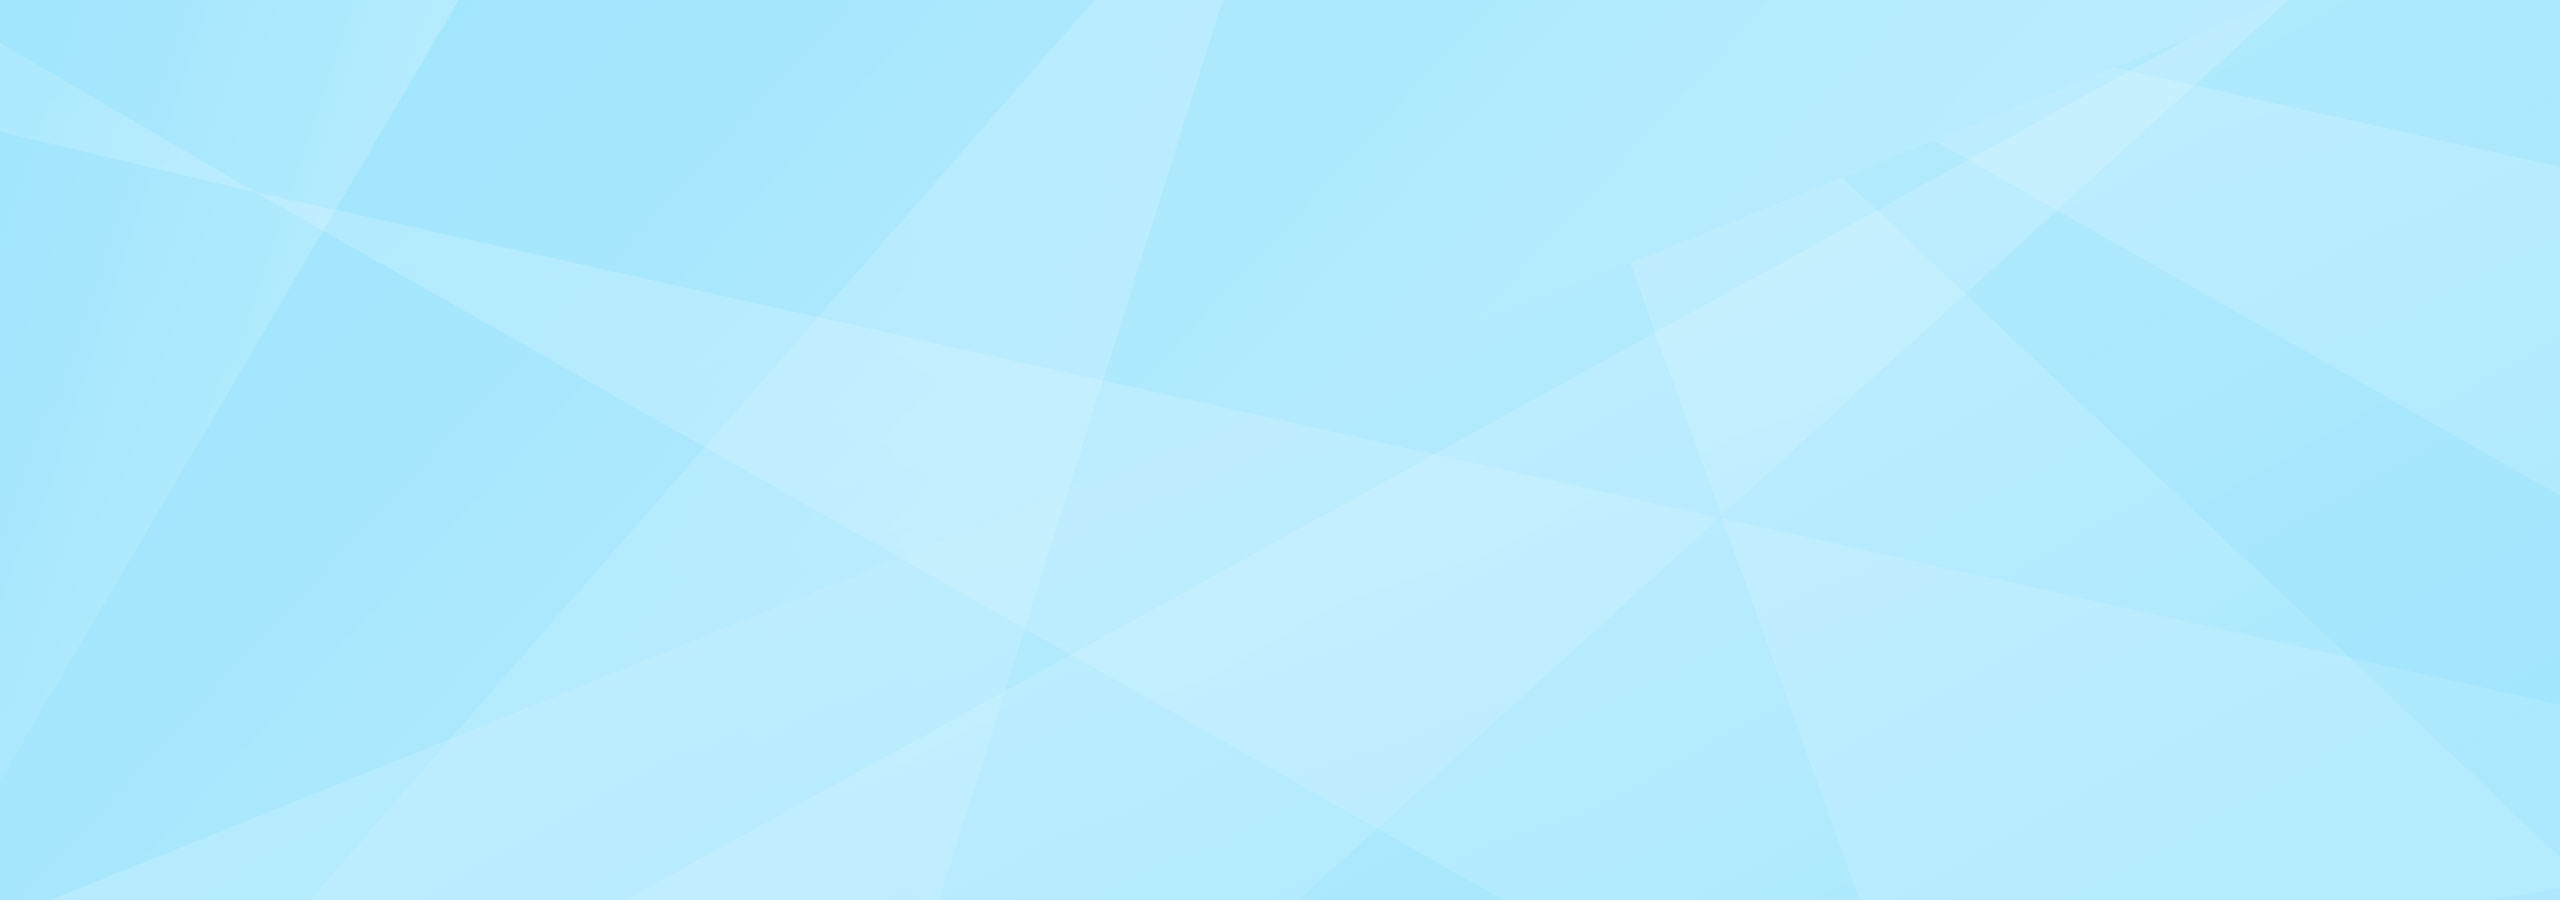 blue geometric bg